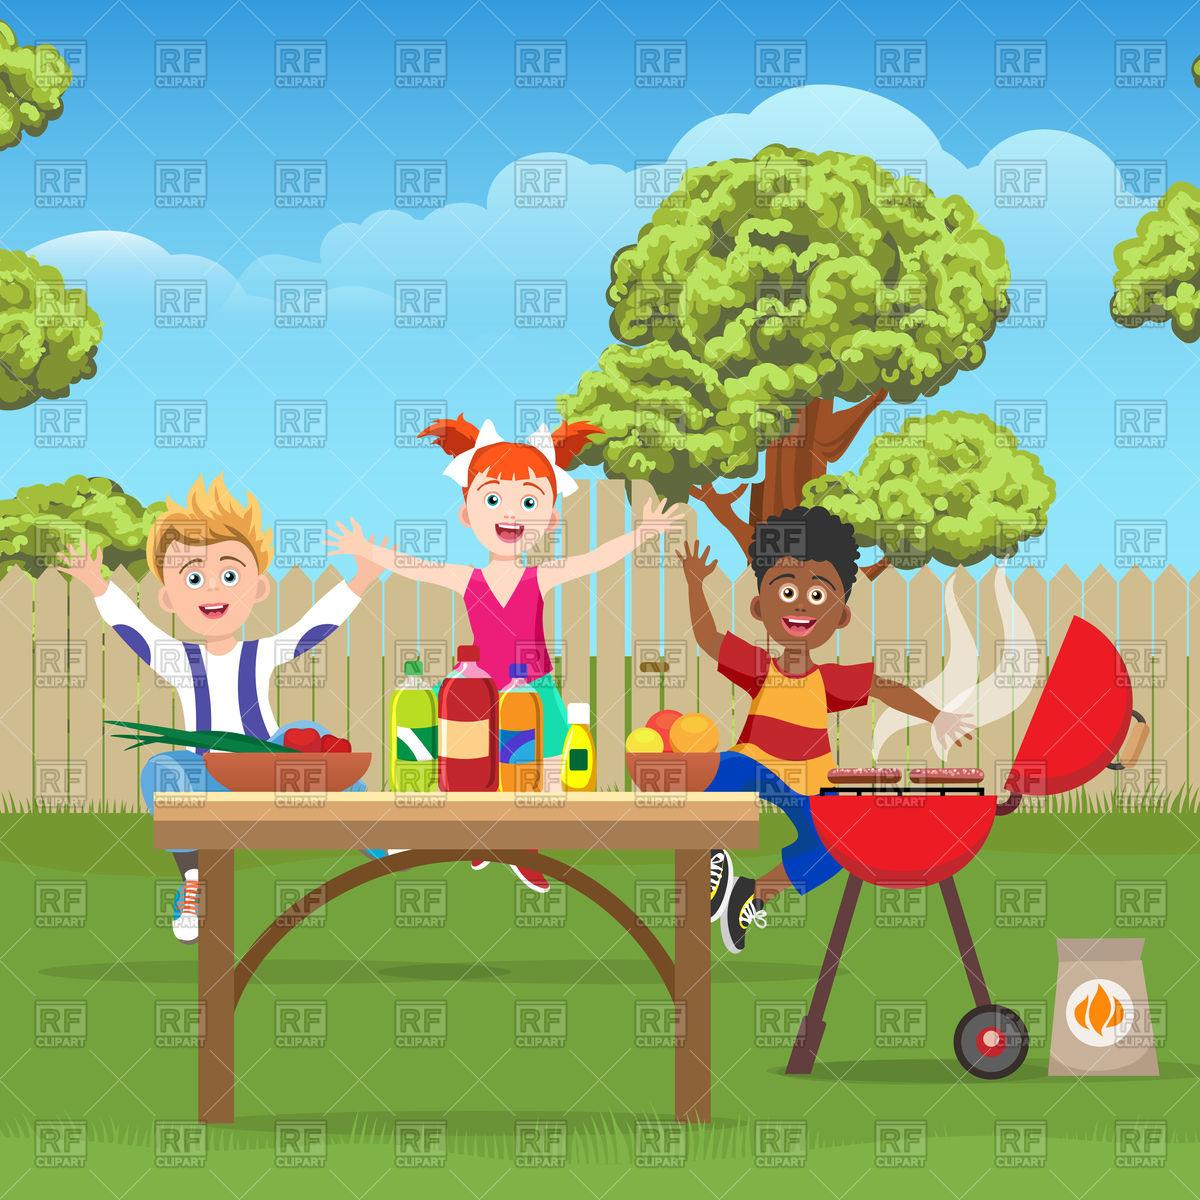 Joyful active kids on barbecue picnic in green garden Stock Vector Image.